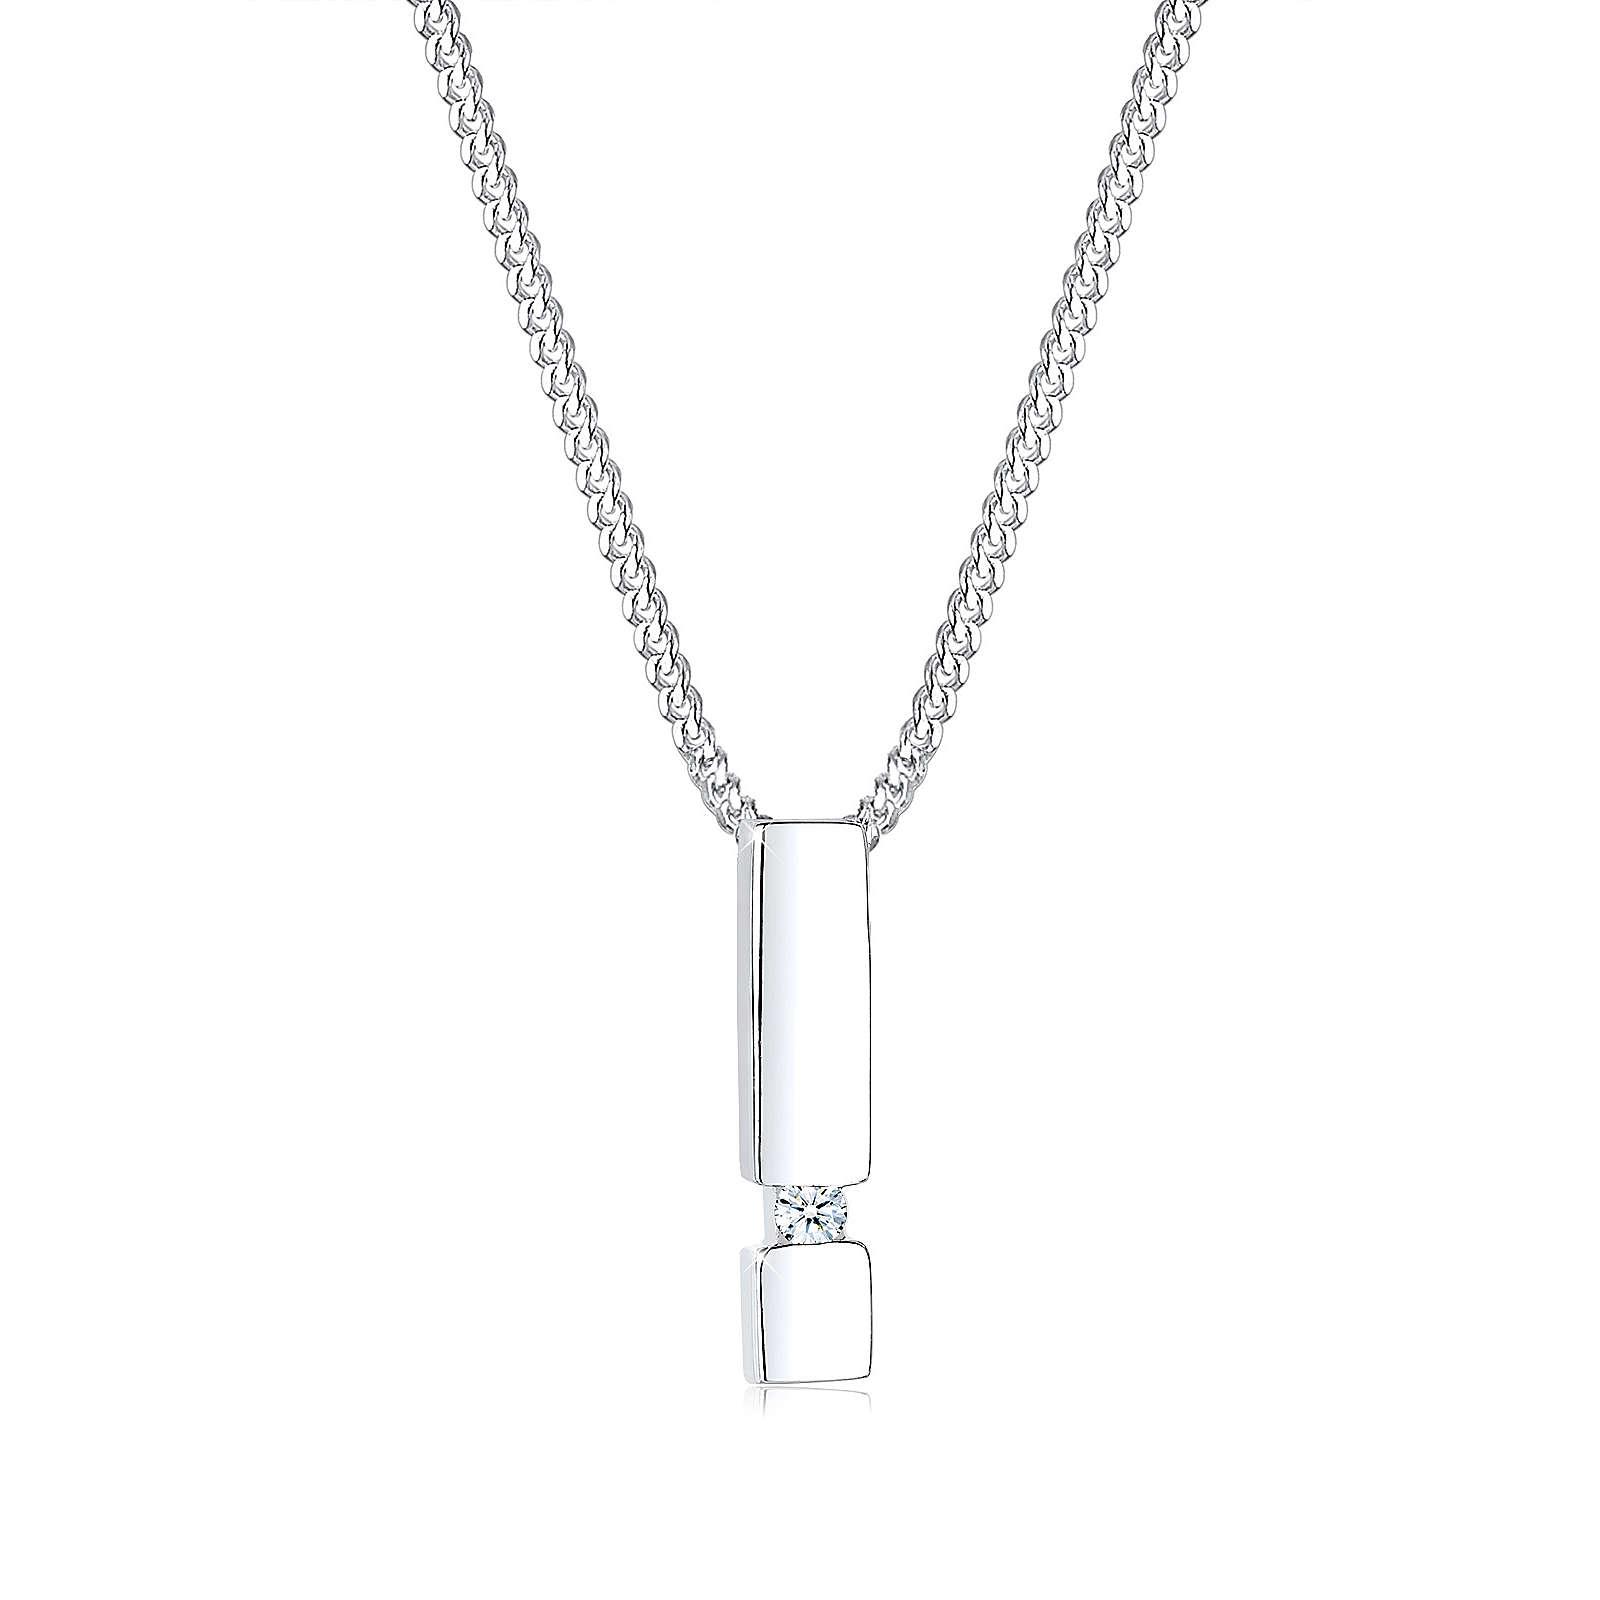 Diamore Halskette Stab Diamant 925 Sterling Silber Damen Gr. one size